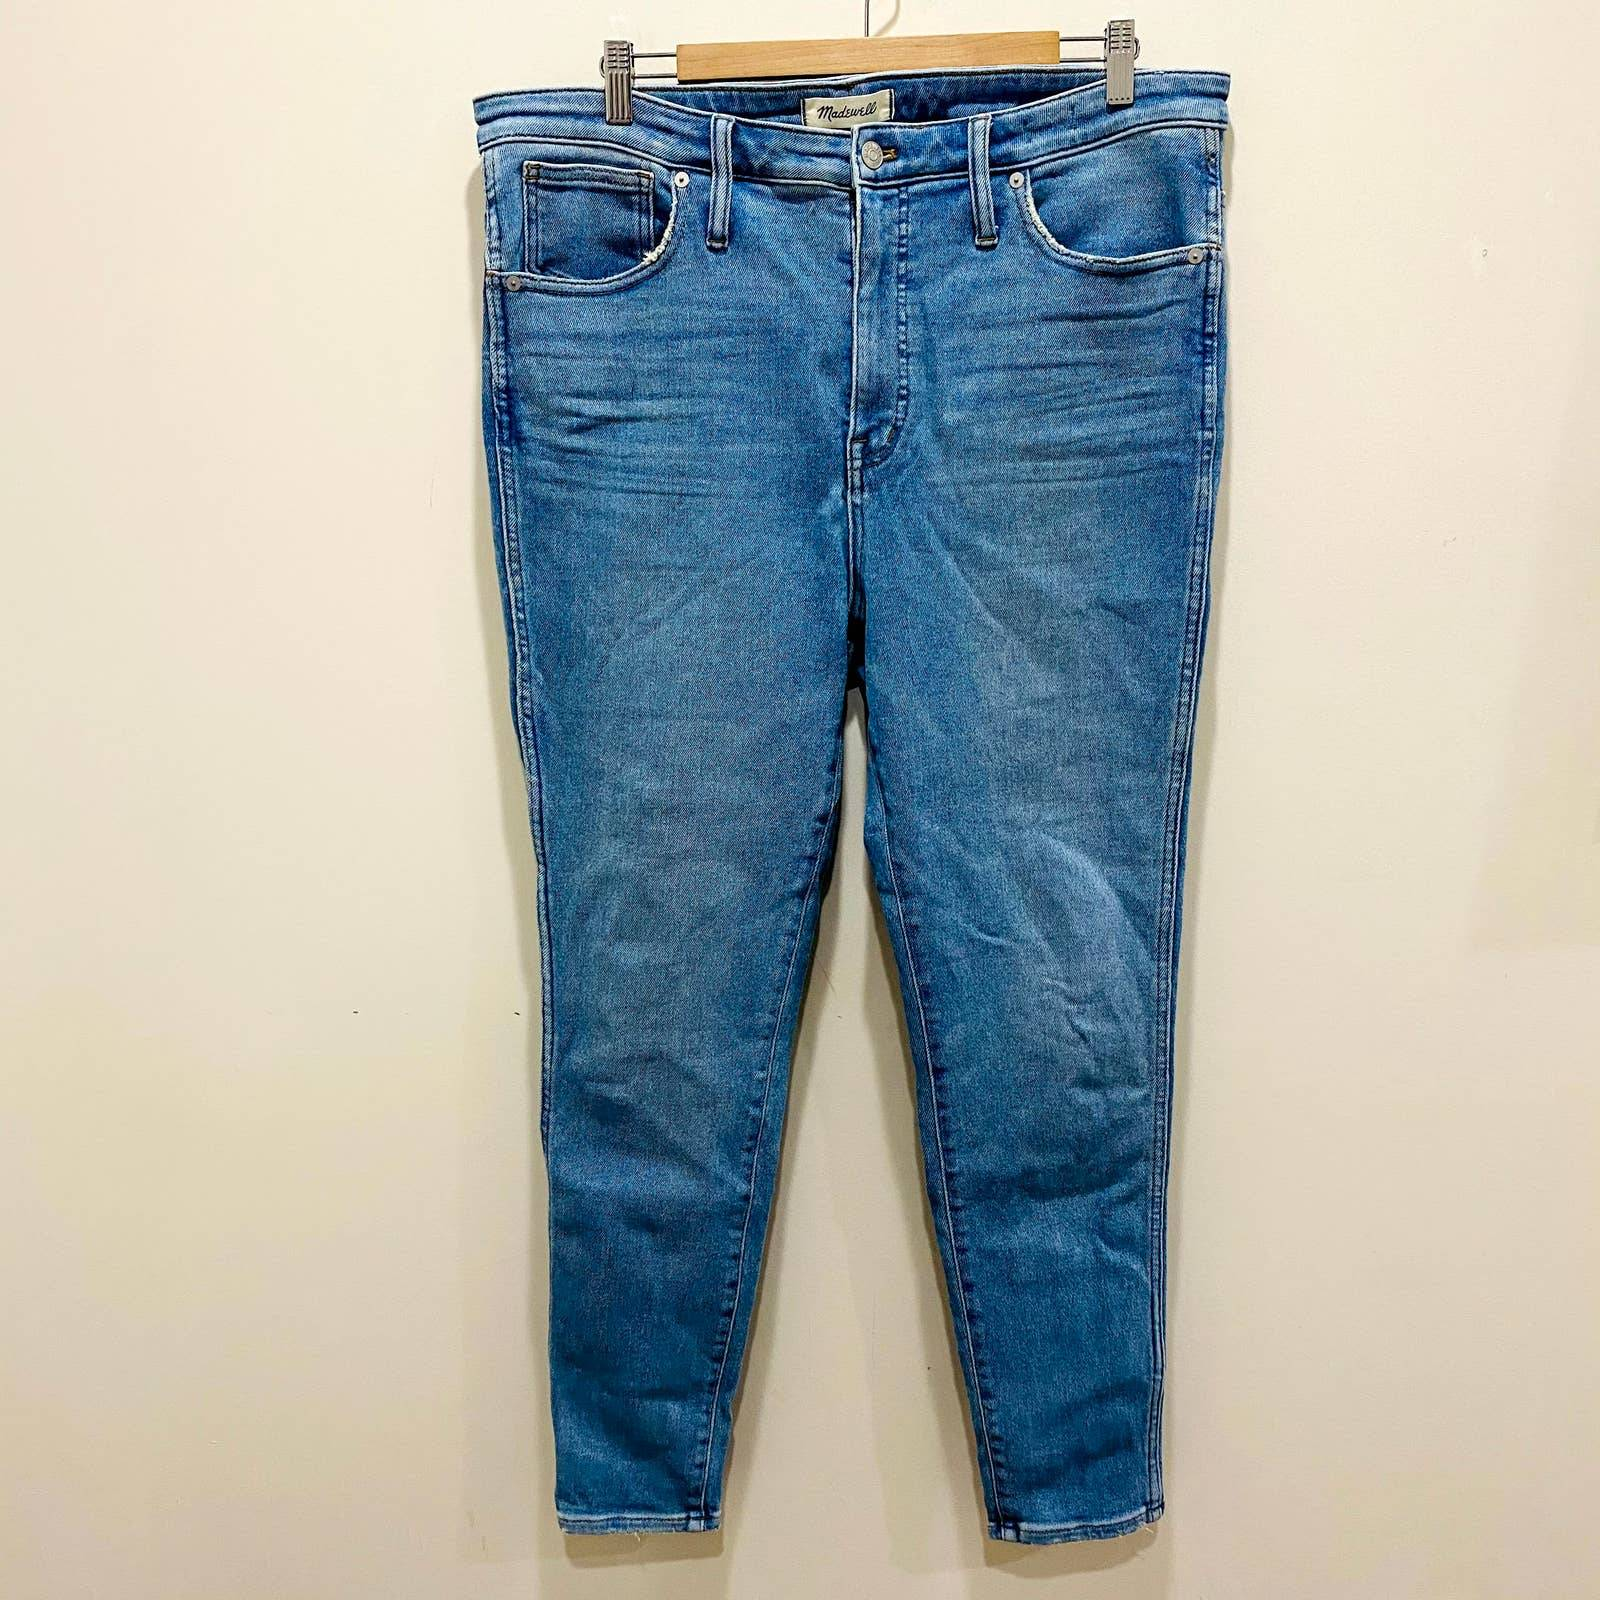 Madewell High Rise Skinny Jean Size 33